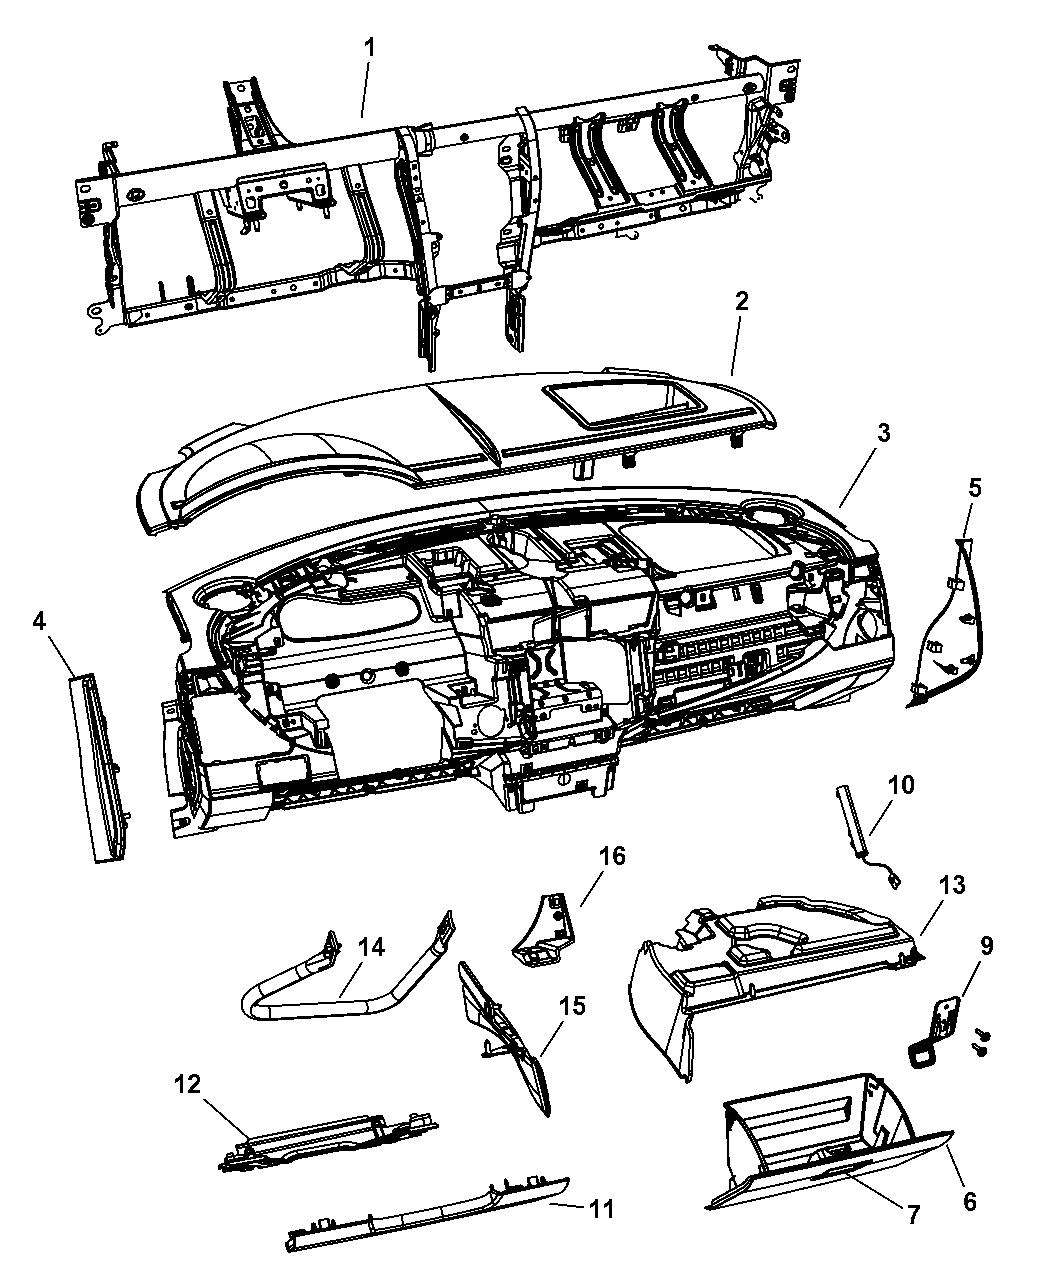 2007 Chrysler Sebring Instrument Panel & Structure